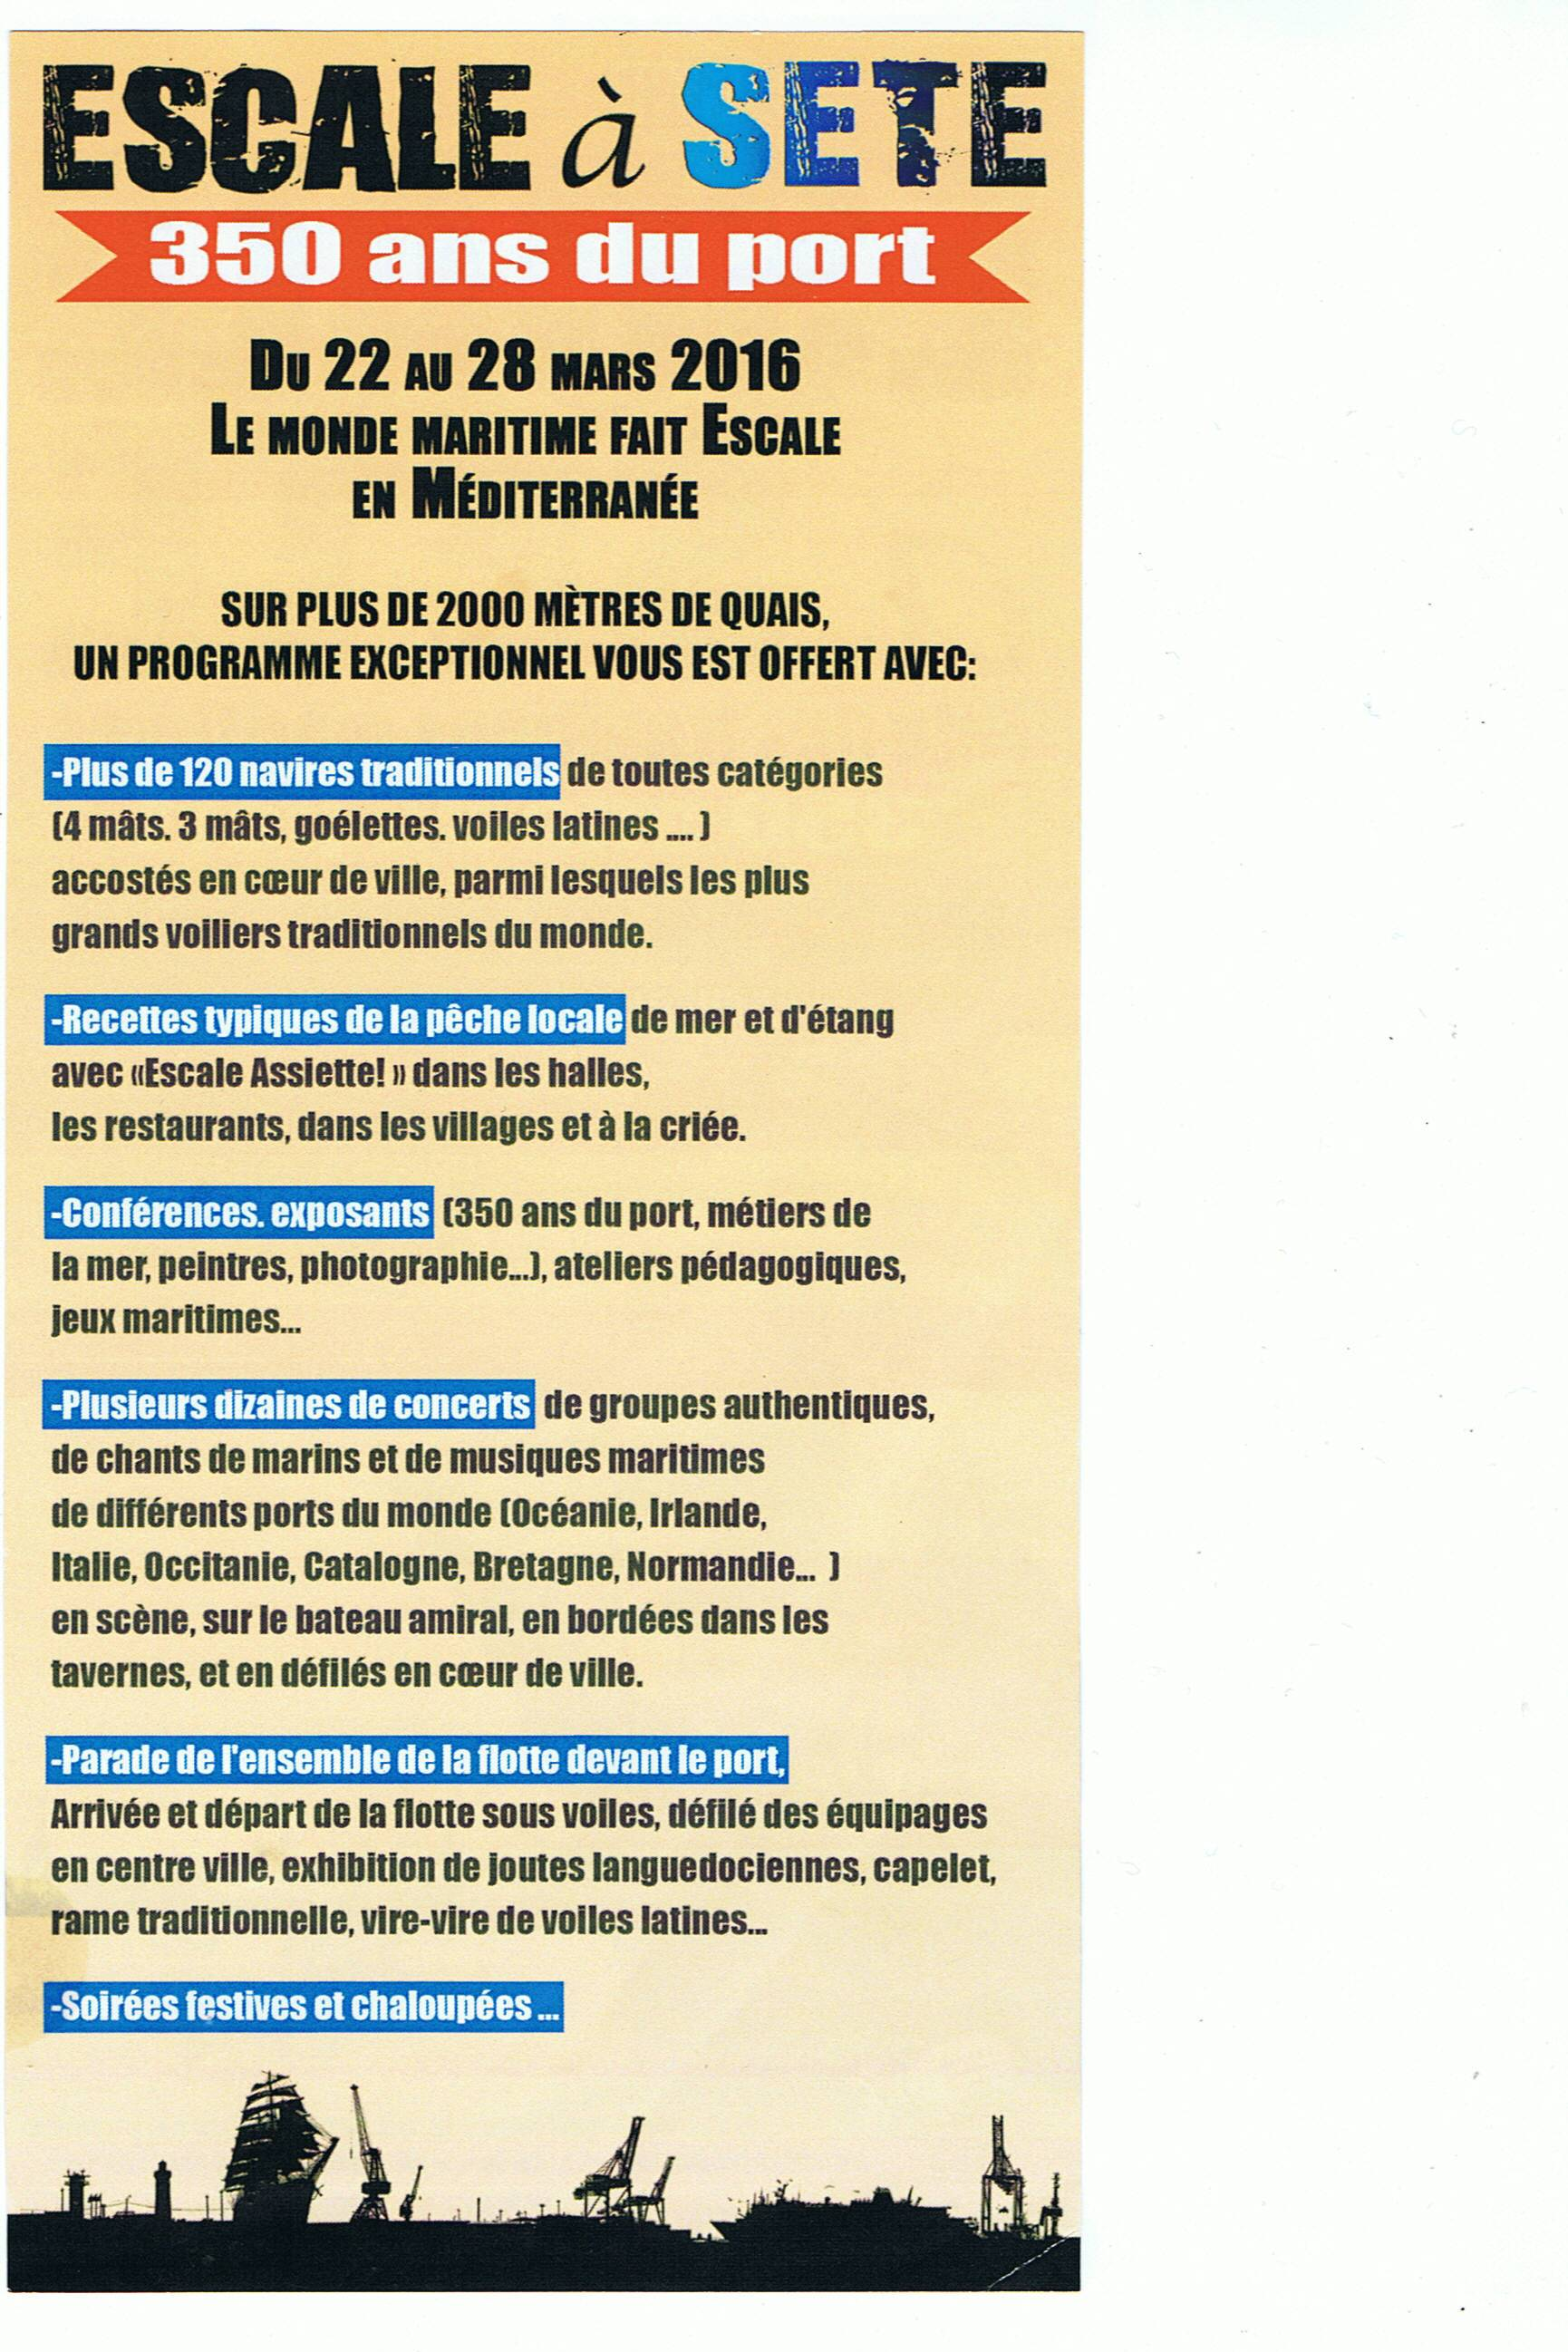 ESCALE SET2